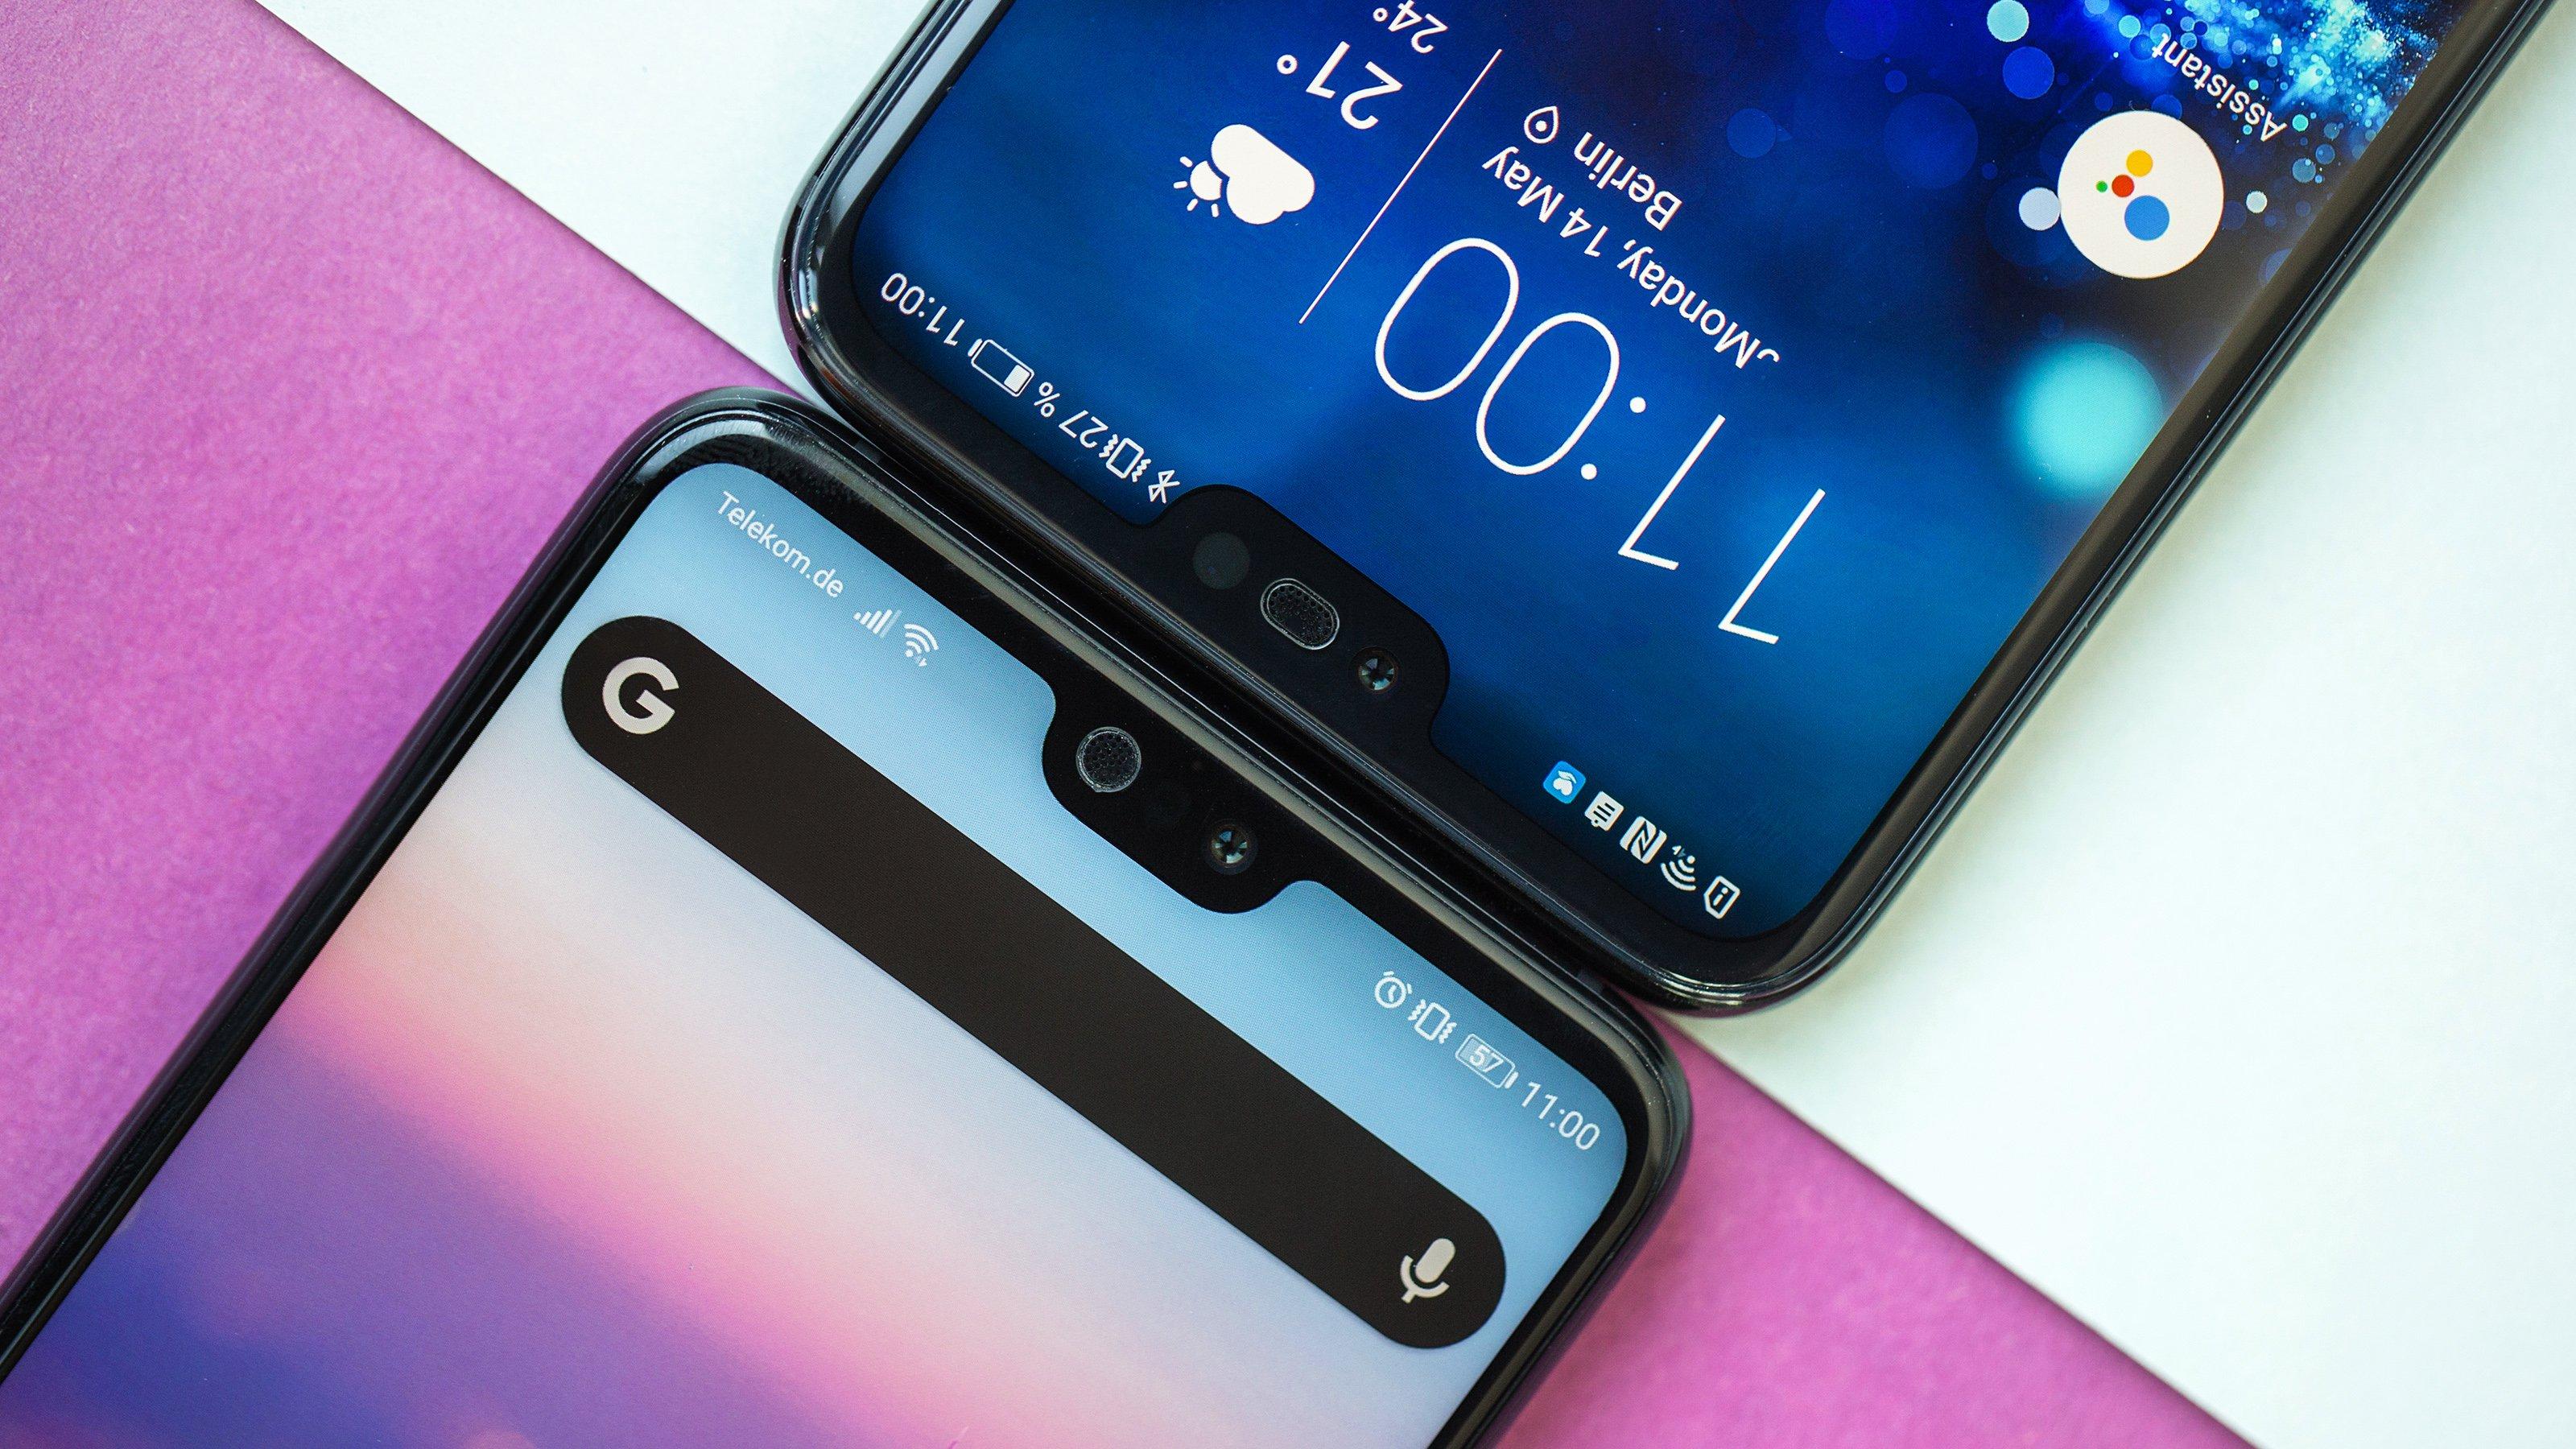 Using Honour Vs Honor: Honor 10 Vs. Huawei P20: Das Ungleiche Duell Der Zwillinge